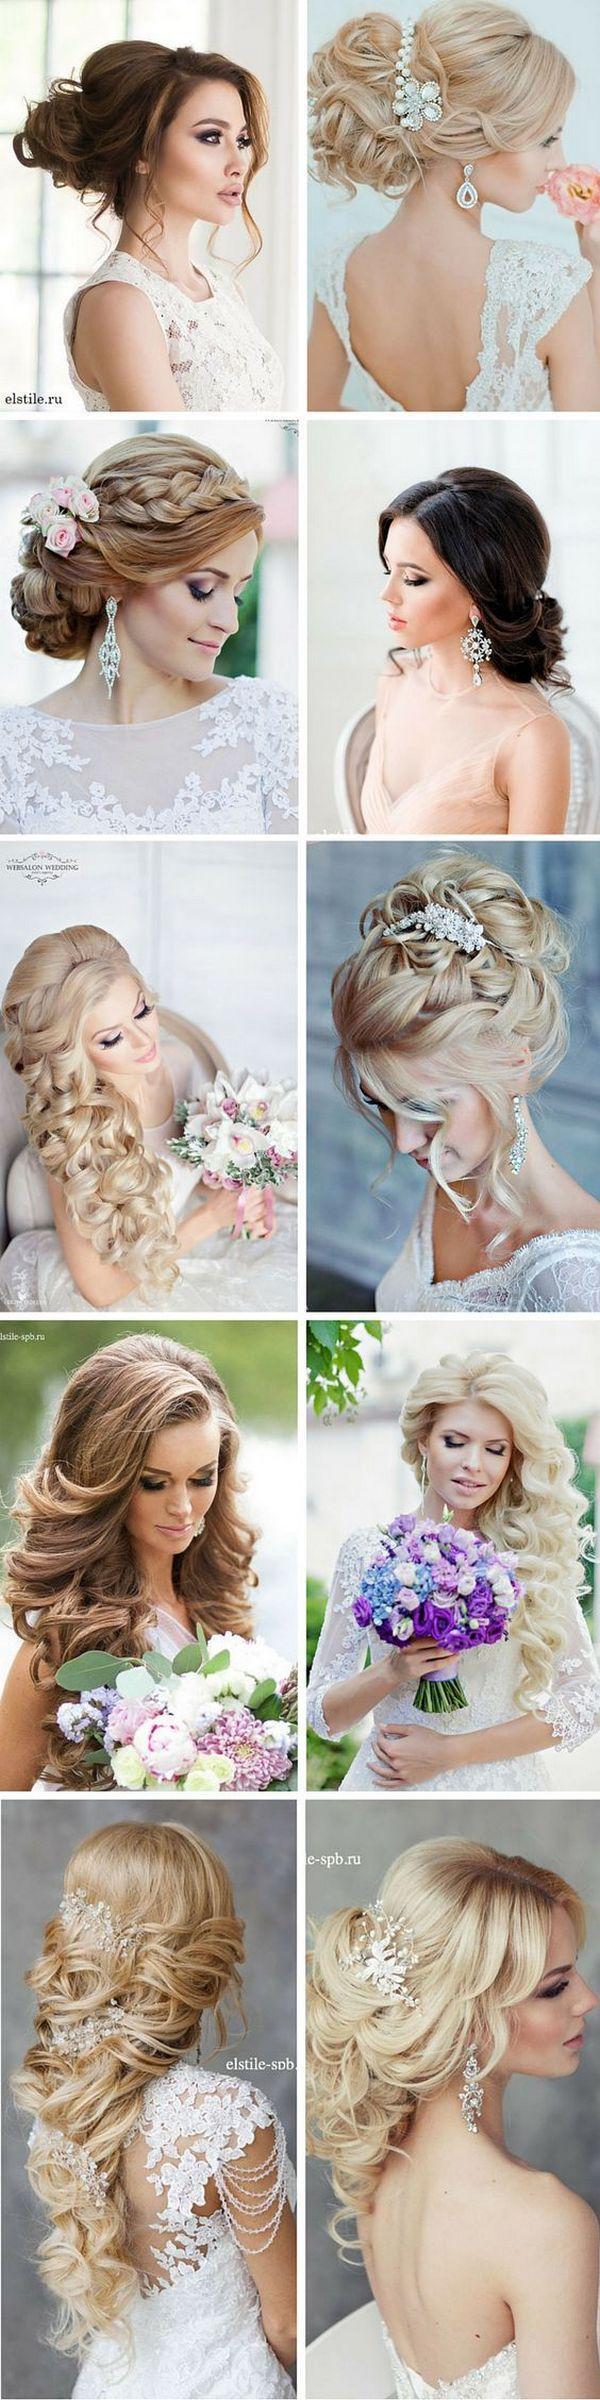 زفاف - 200 Bridal Wedding Hairstyles For Long Hair That Will Inspire